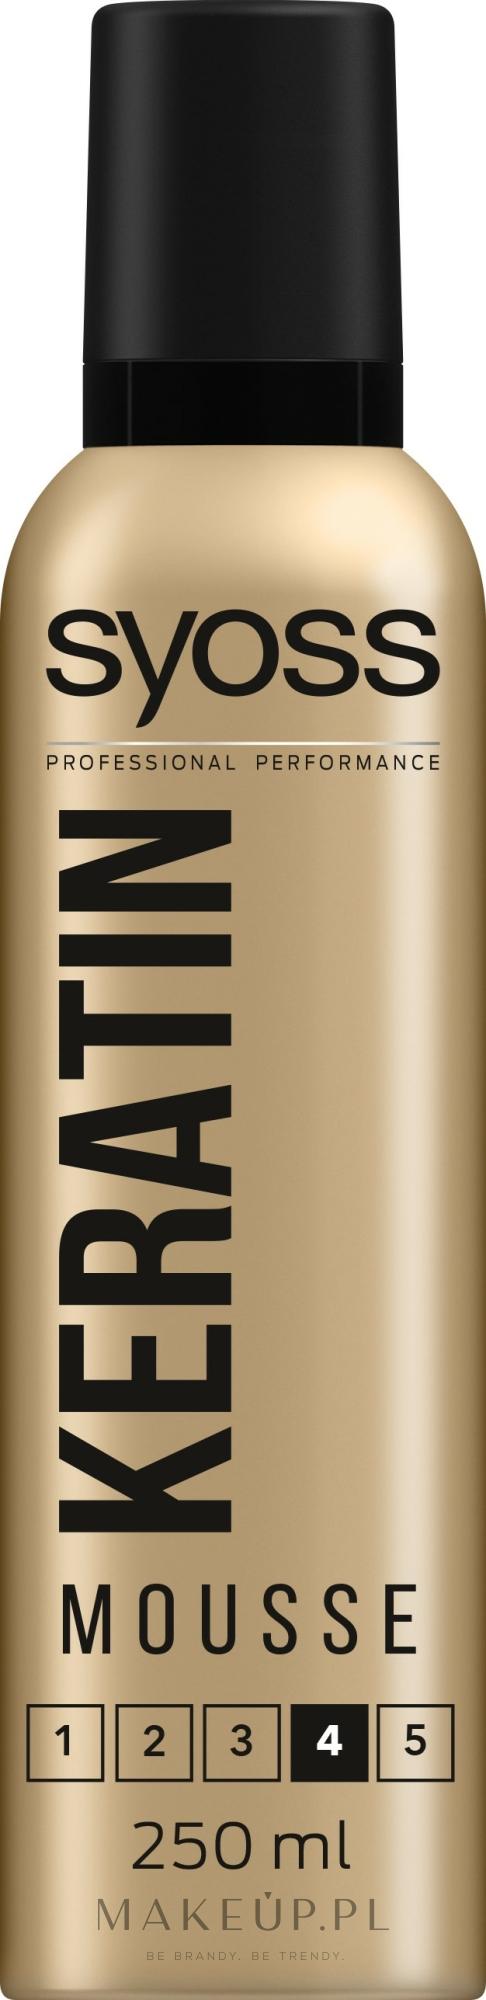 Supermocna pianka do włosów - Syoss Keratin Style Perfection Mousse — фото 250 ml